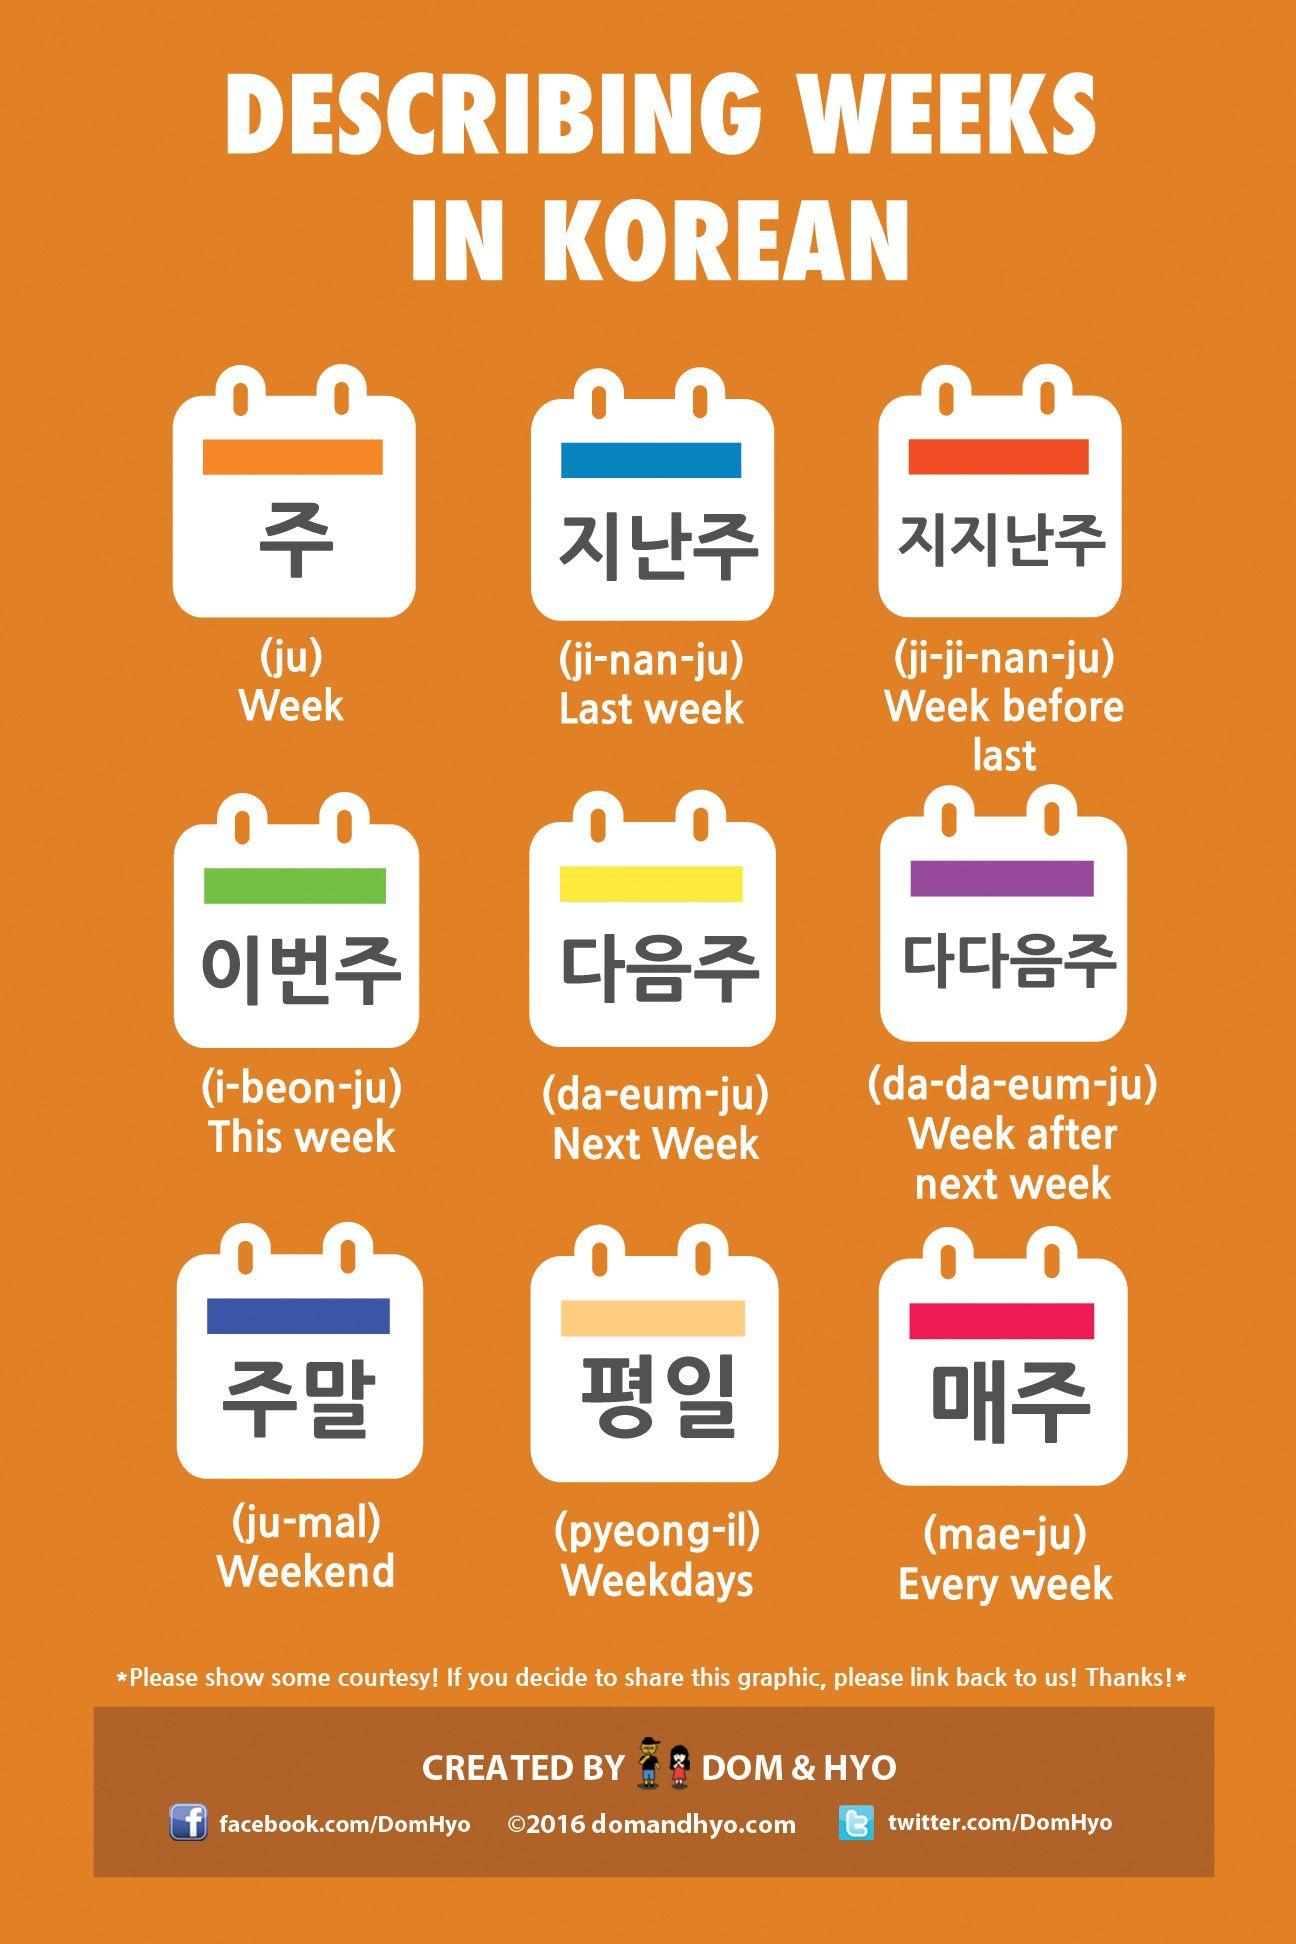 Why don't South Koreans speak English? - Quora